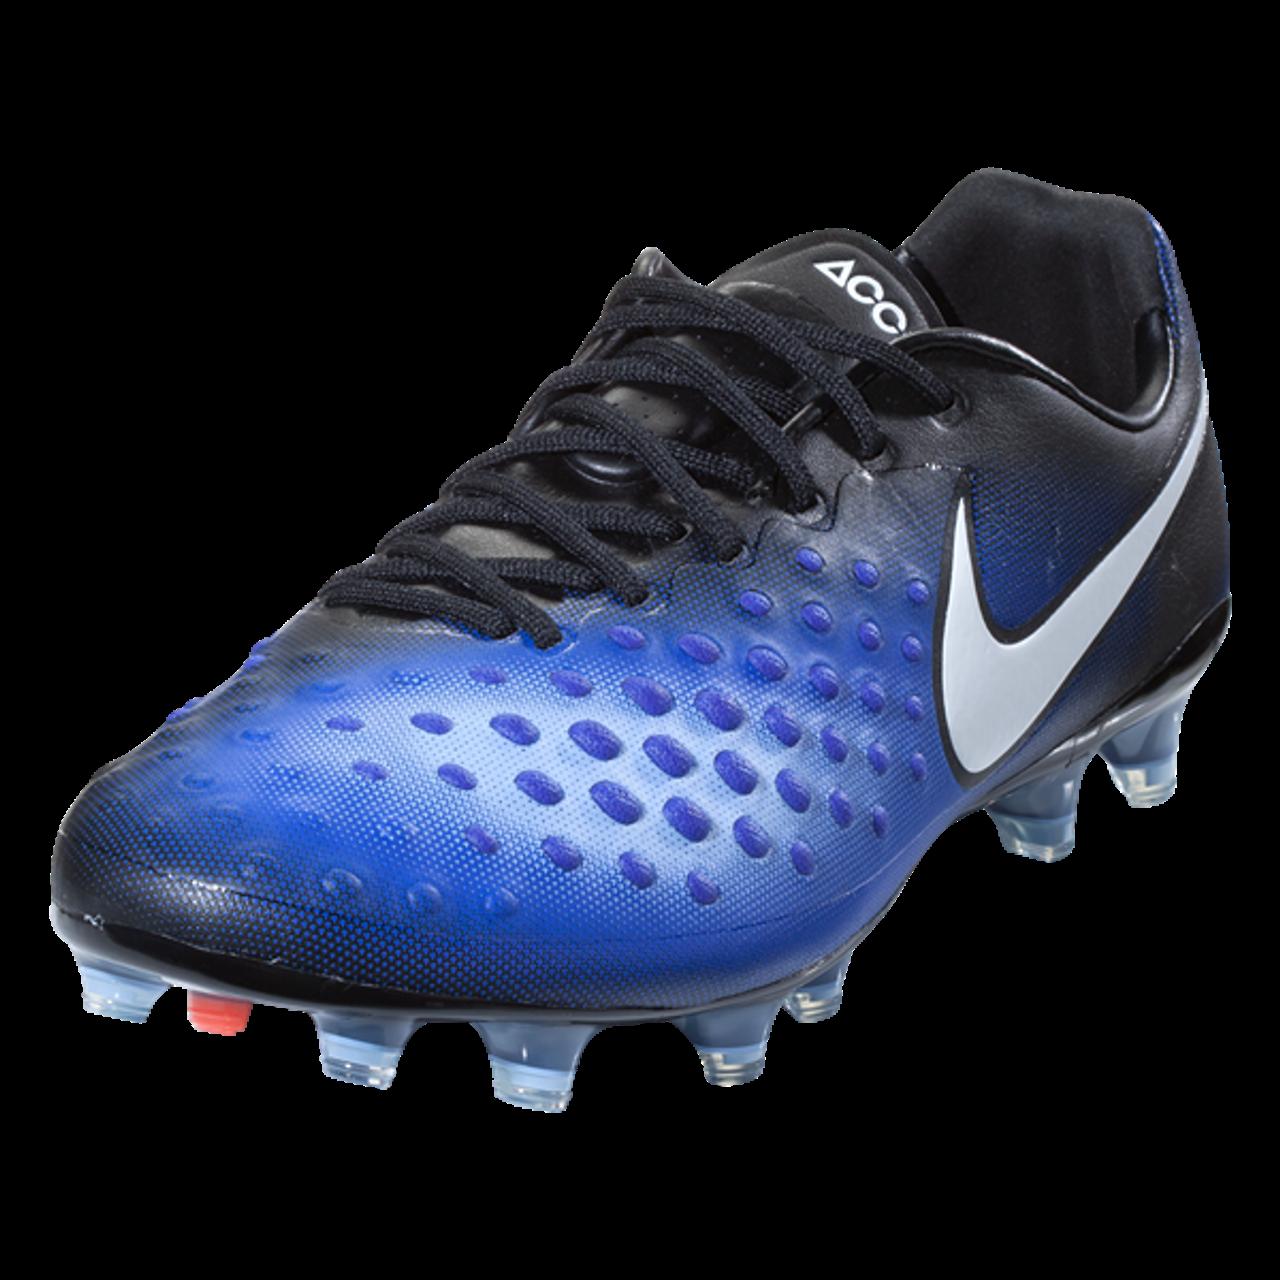 ebdc6f669402 Nike Magista Opus II FG - Black/White/Paramount Blue/Aluminum - ohp soccer